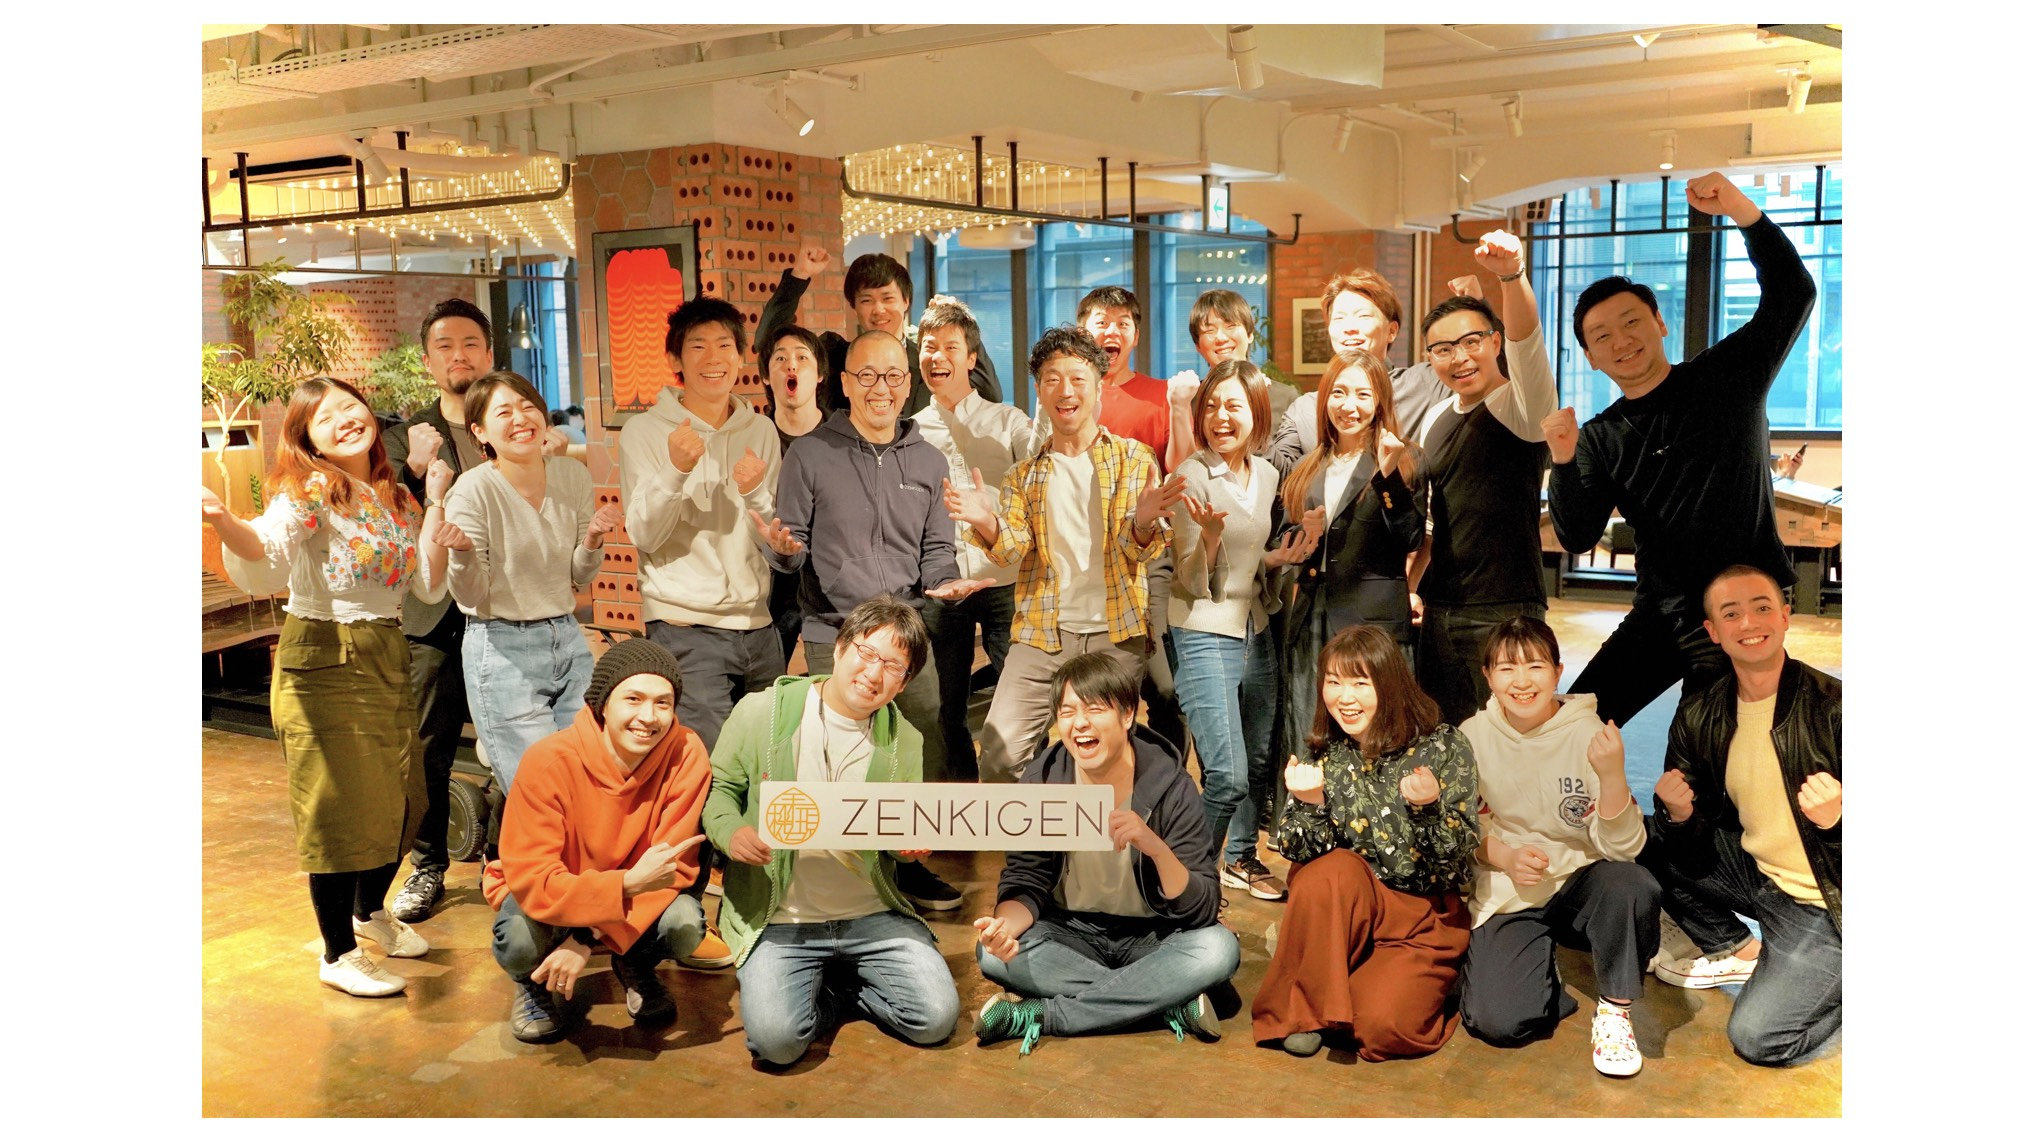 WEB面接サービス「HARUTAKA」のZENKIGEN、シリーズAで8億円の資金調達を実施